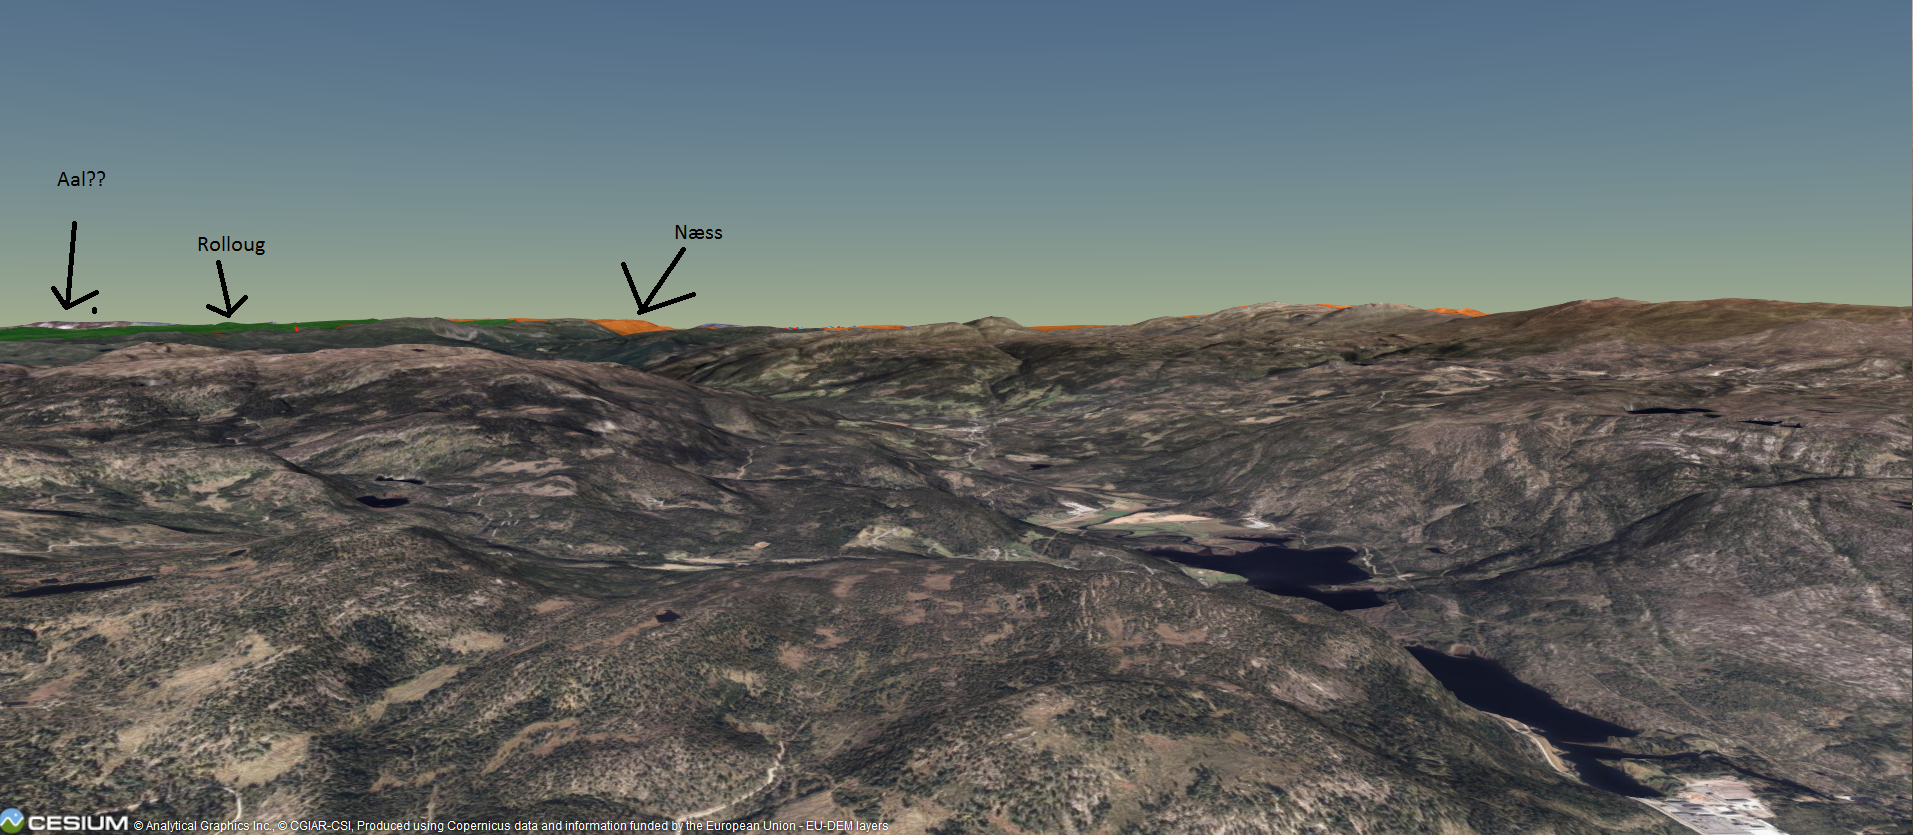 Testing Geospatial claims using Qgis, CartoDB and Cesium js   Hc